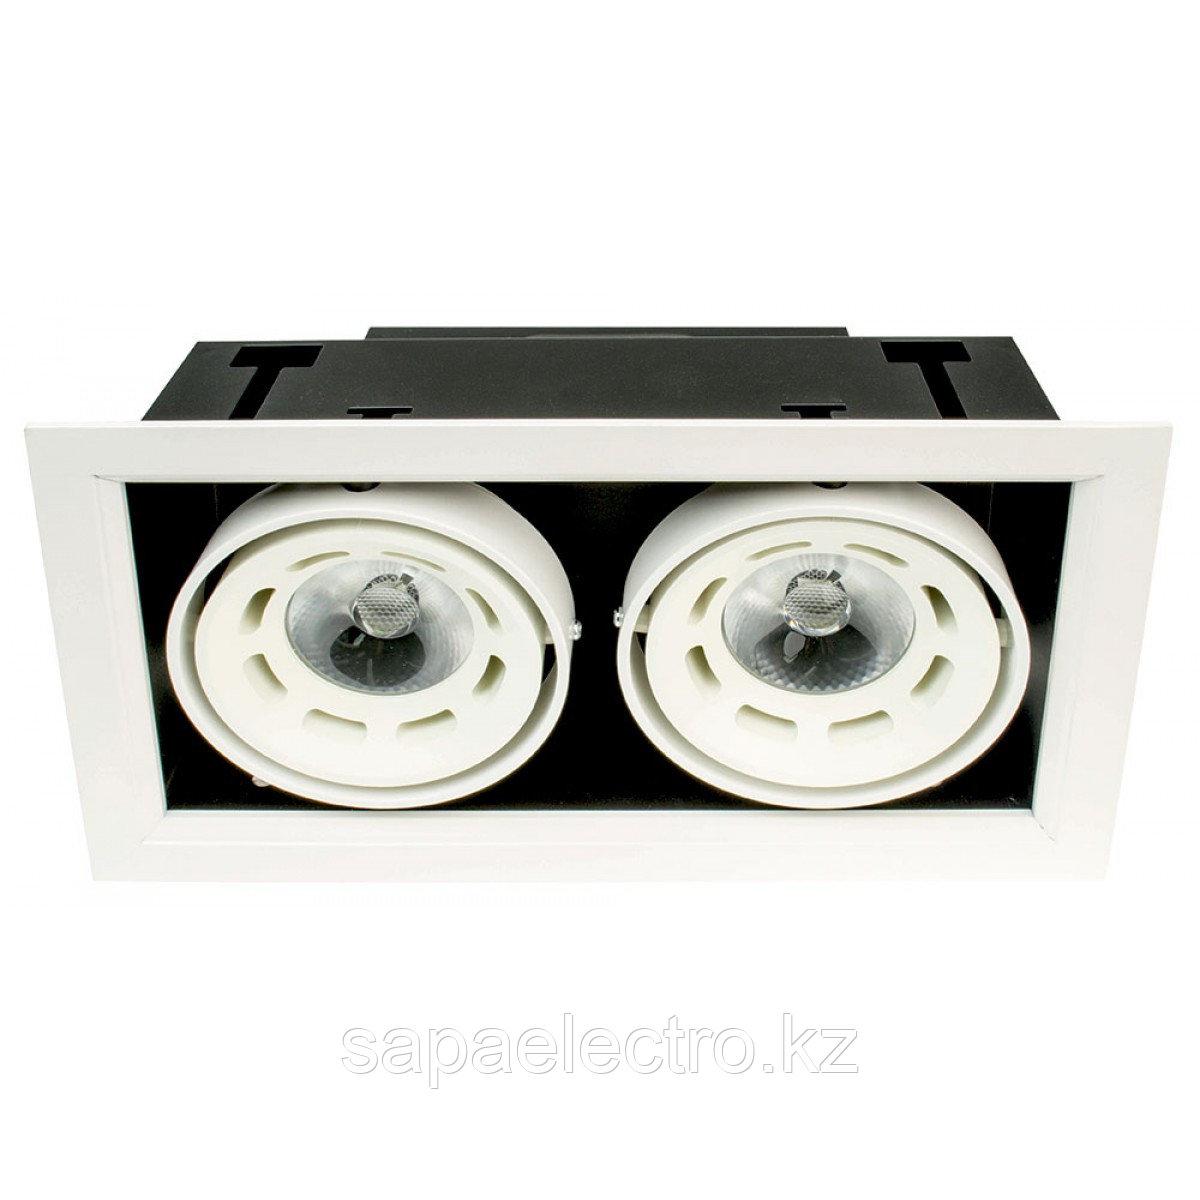 Свет-к DOWNLIGHT LED DD1218 2х8W WHITE5000K(TS)18